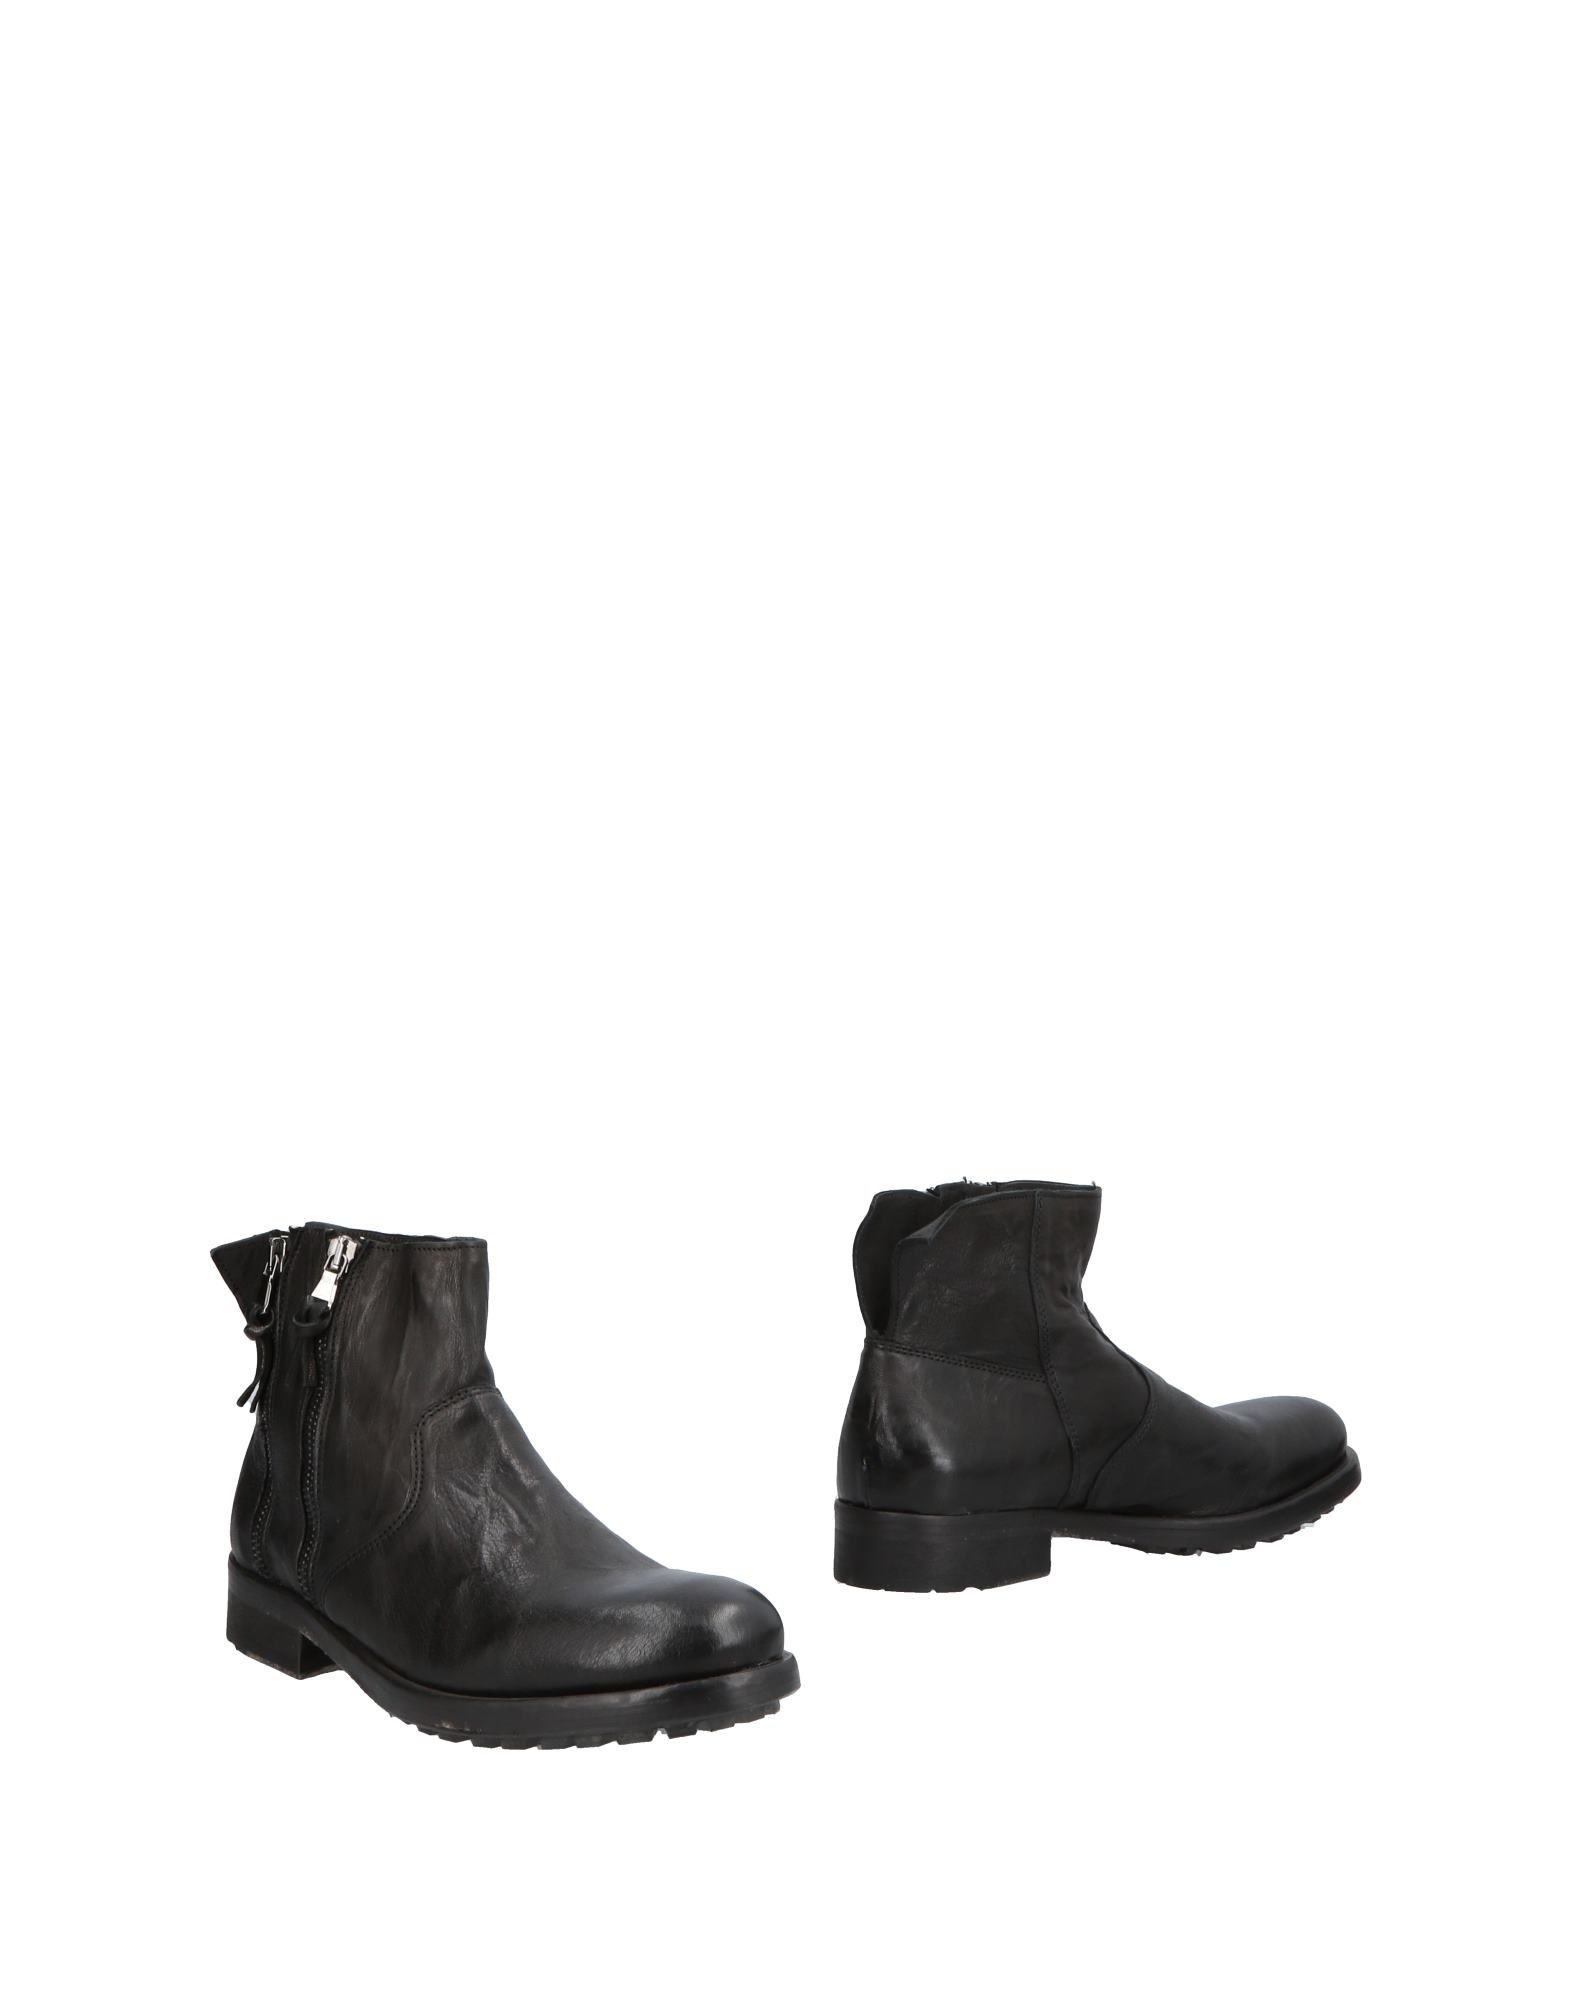 PAWELK'S Boots in Black